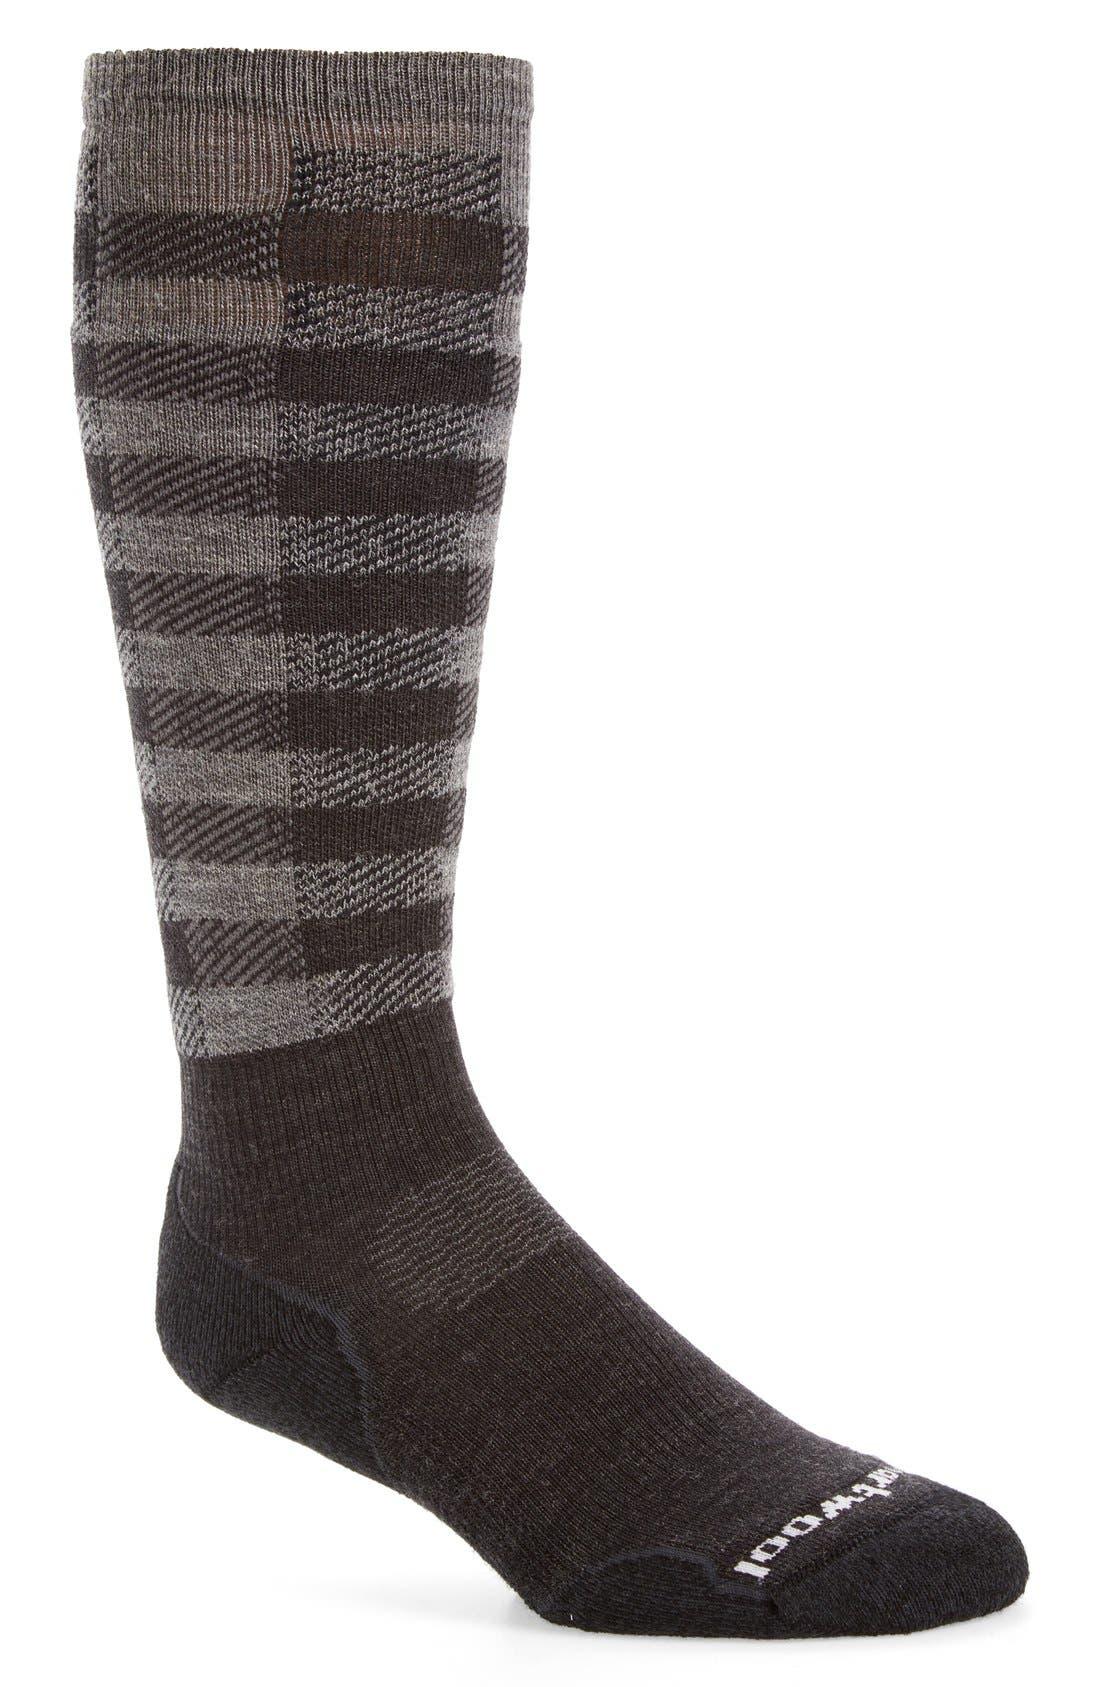 Main Image - Smartwool PhD® Slopestyle Light Ifrane Over the Calf Socks